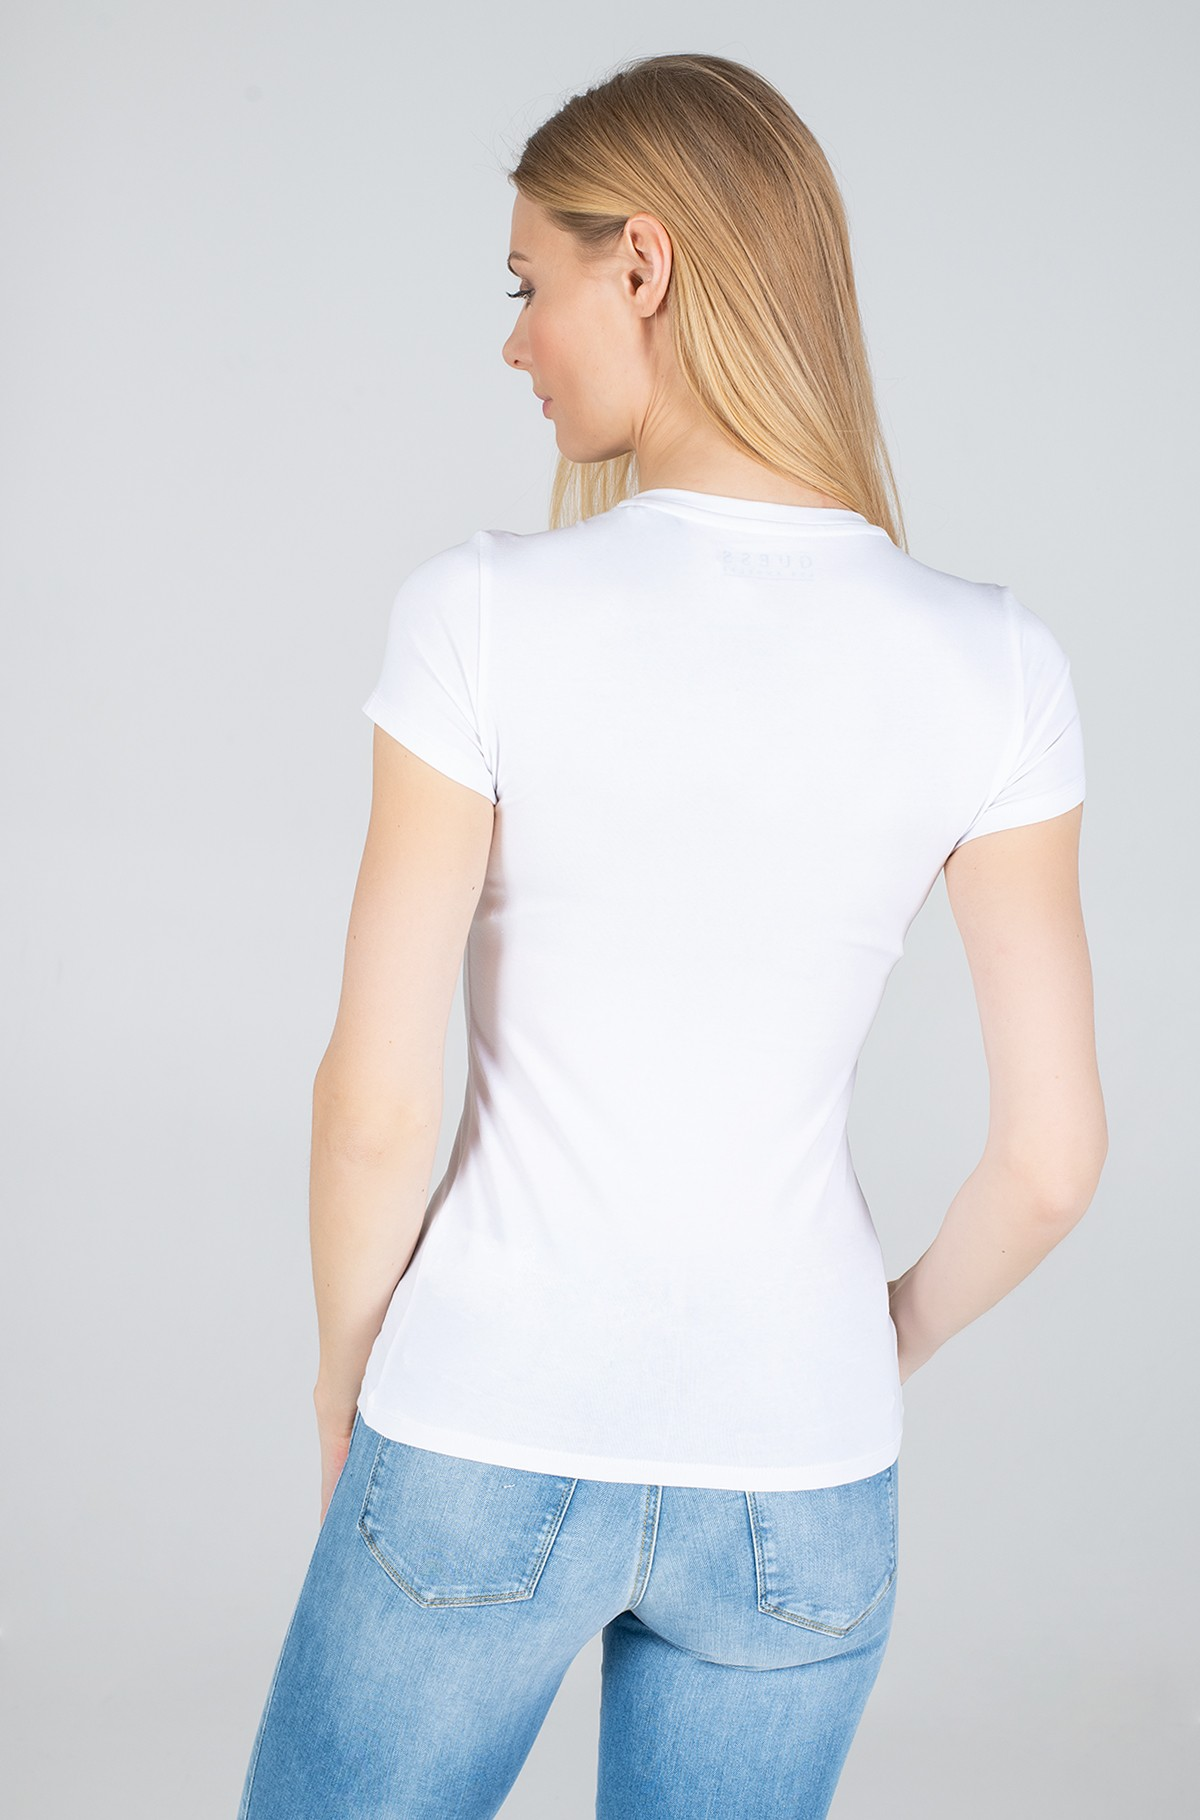 T-shirt W01I20 J1300-full-3